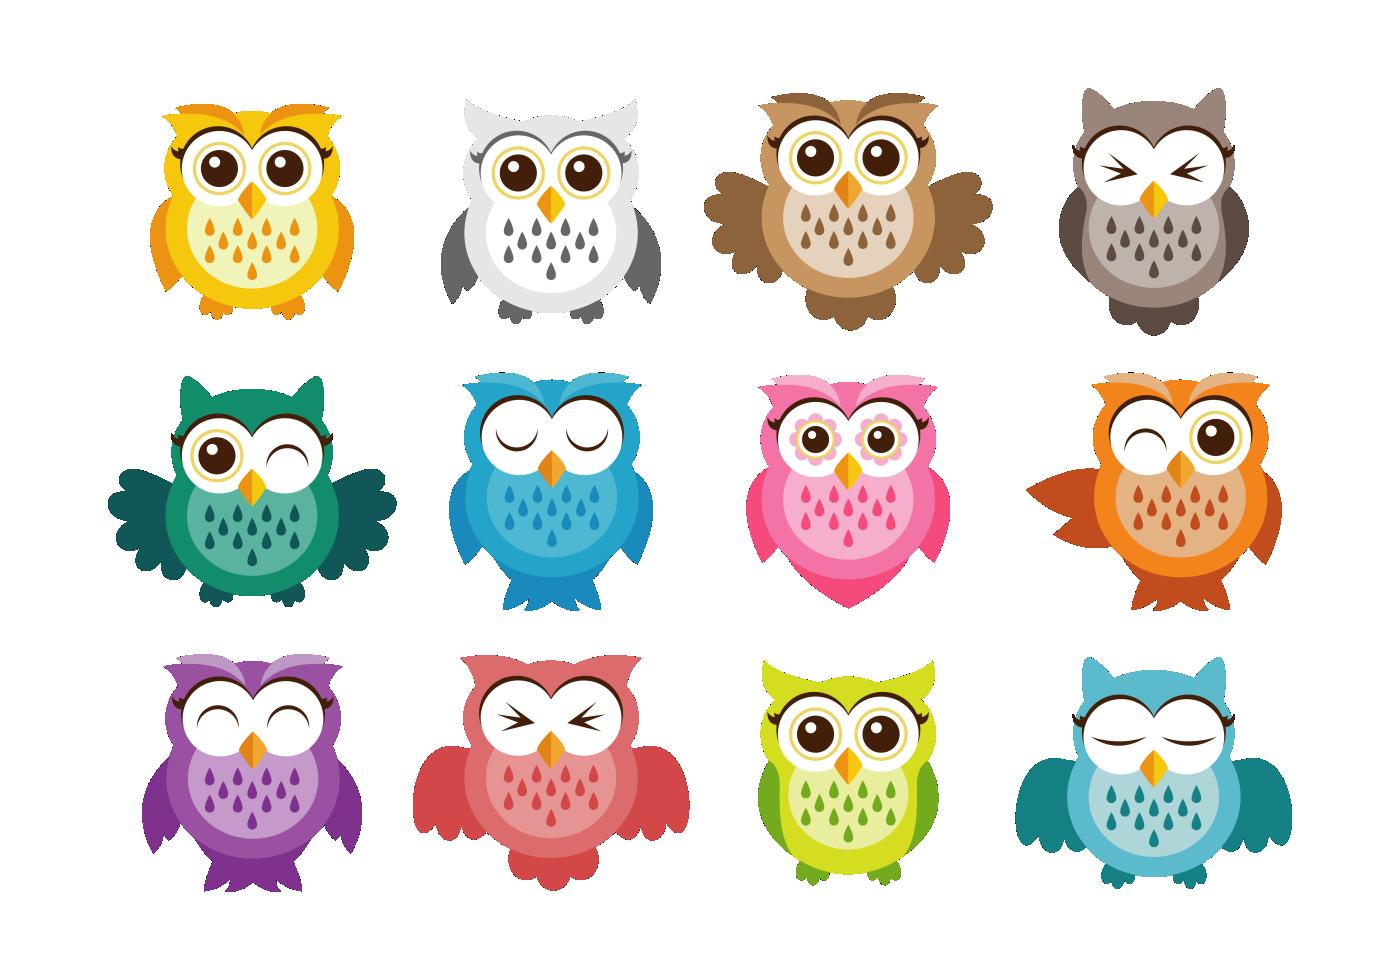 Cute Owl Vector Icons